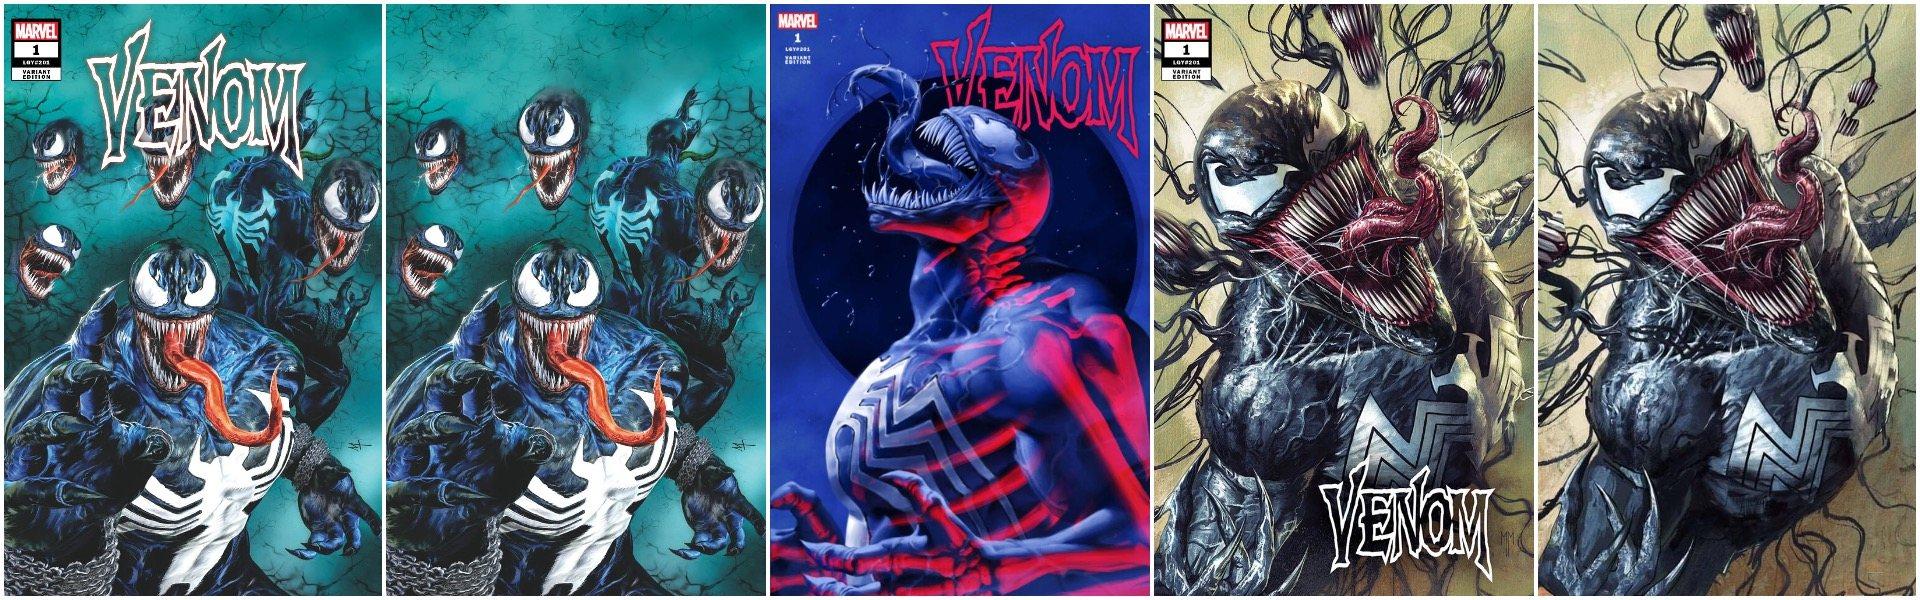 Venom #1 Exclusives